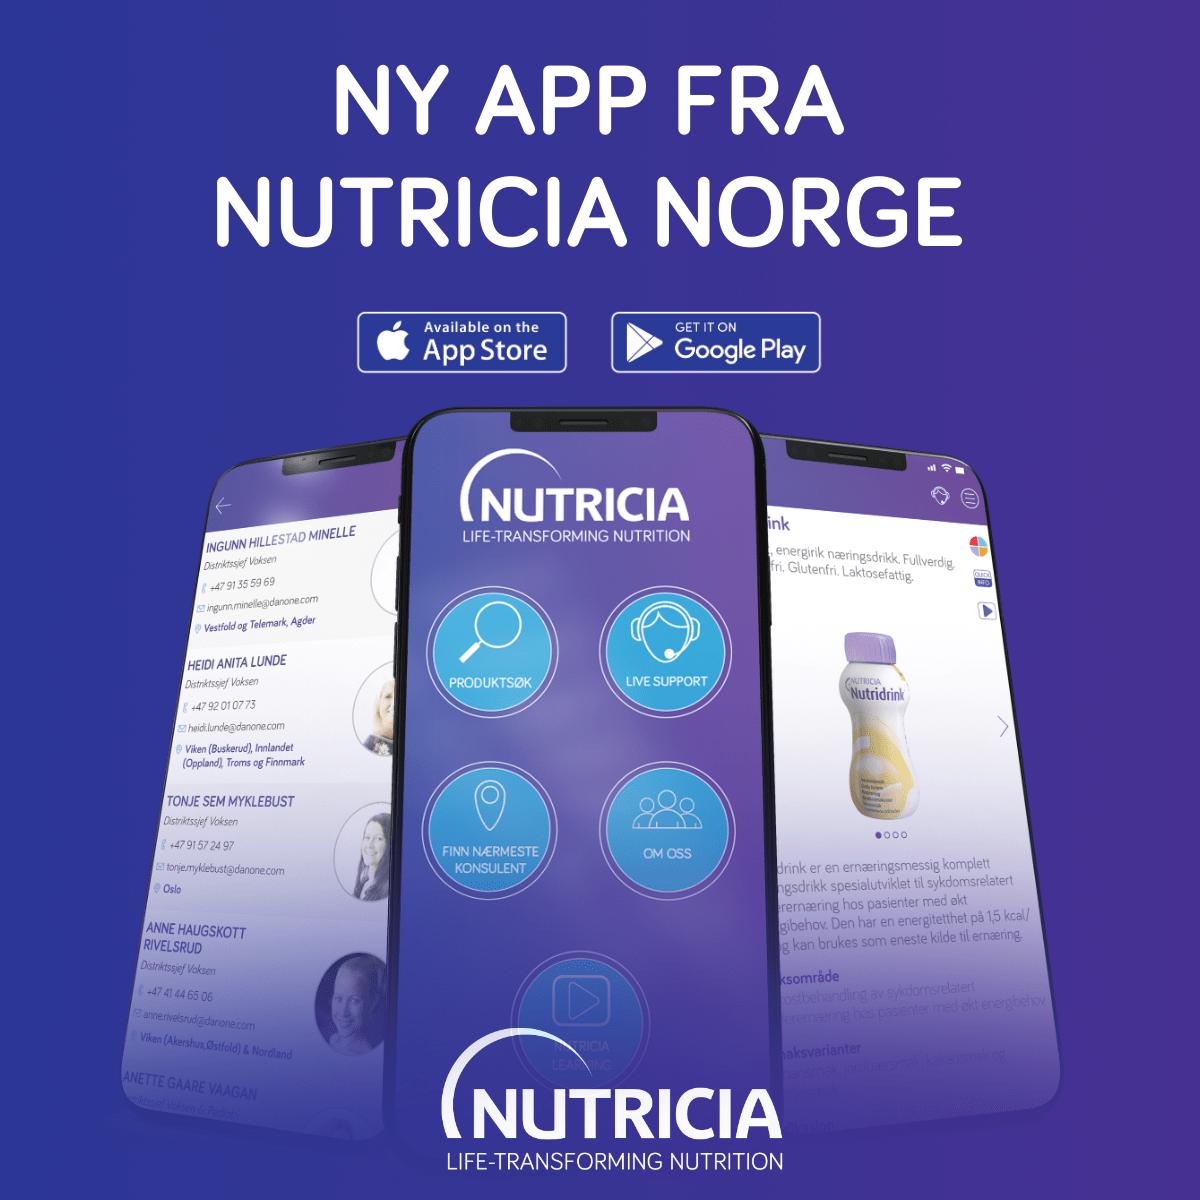 Ny app fra Nutrica!